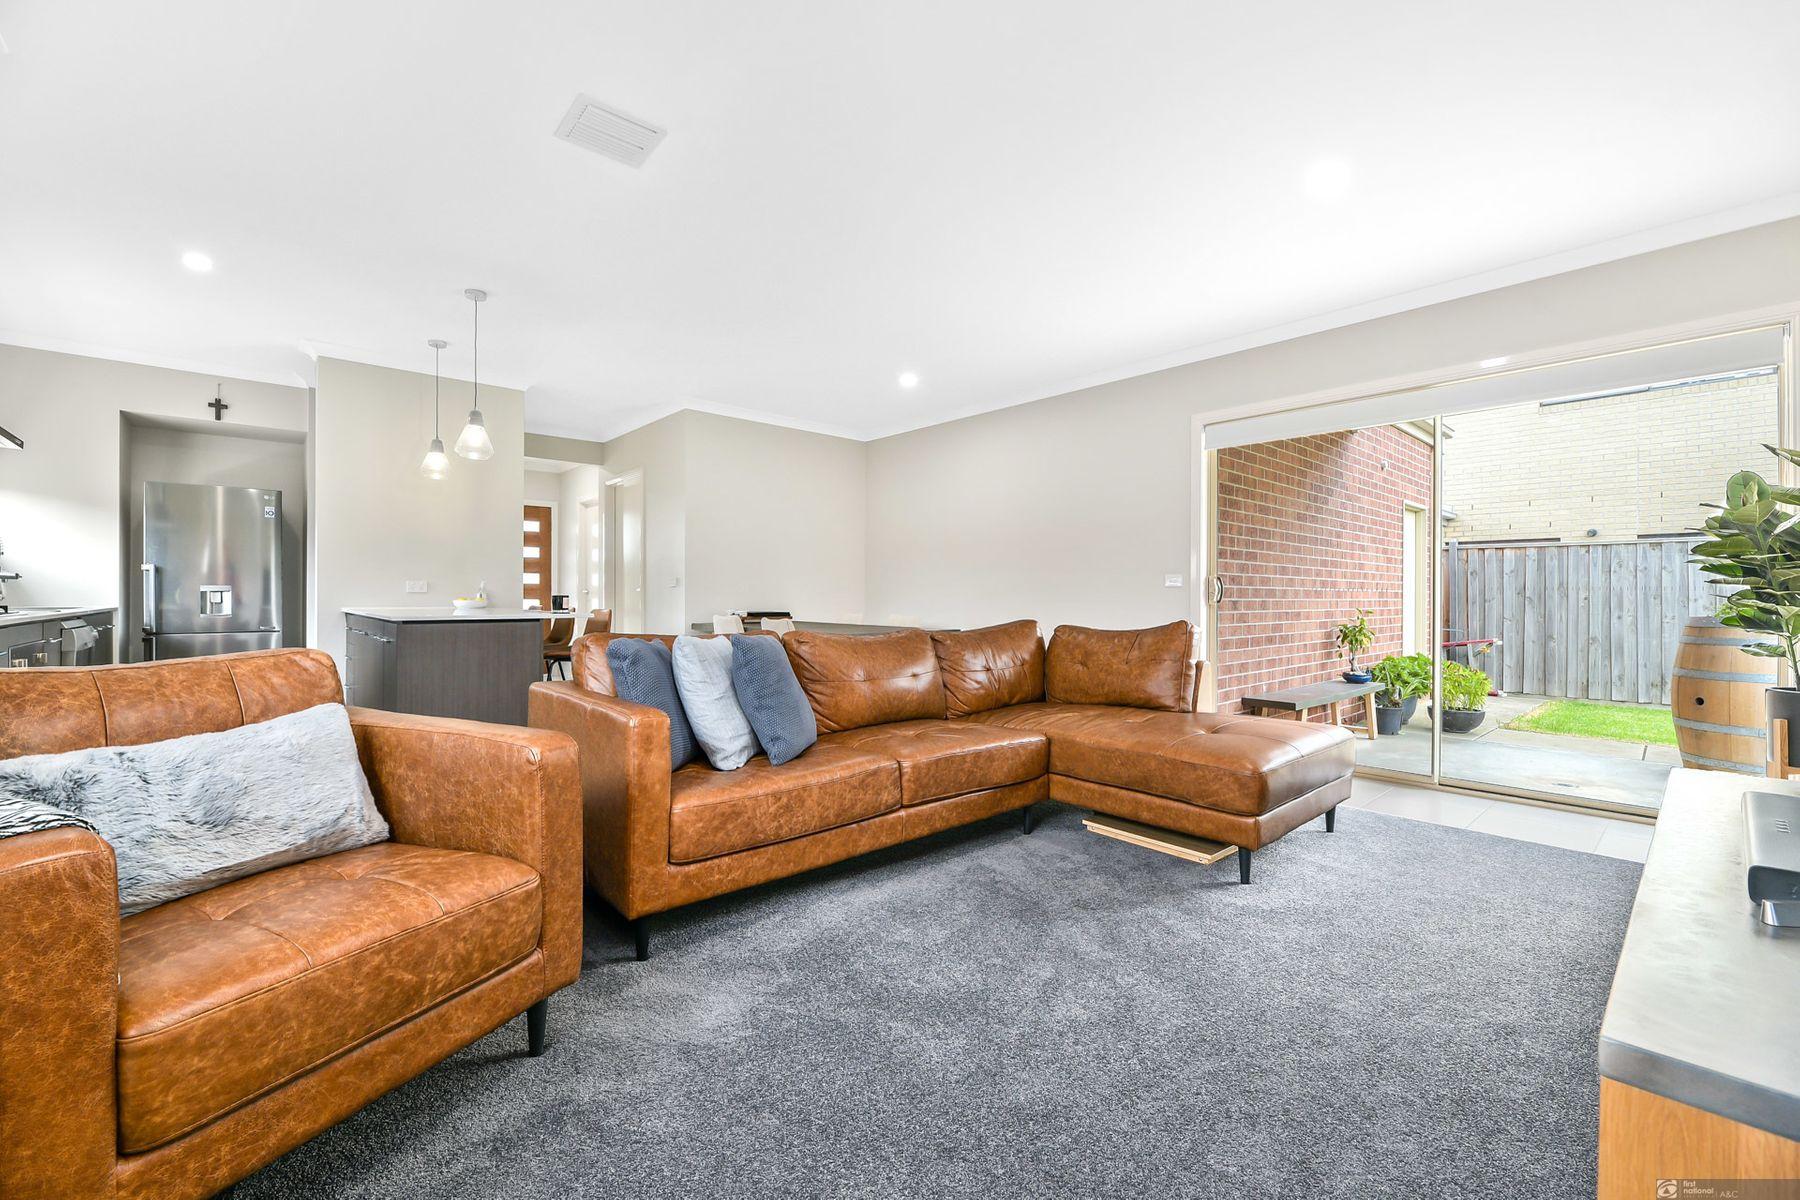 23 Casandra Court, Berwick, VIC 3806